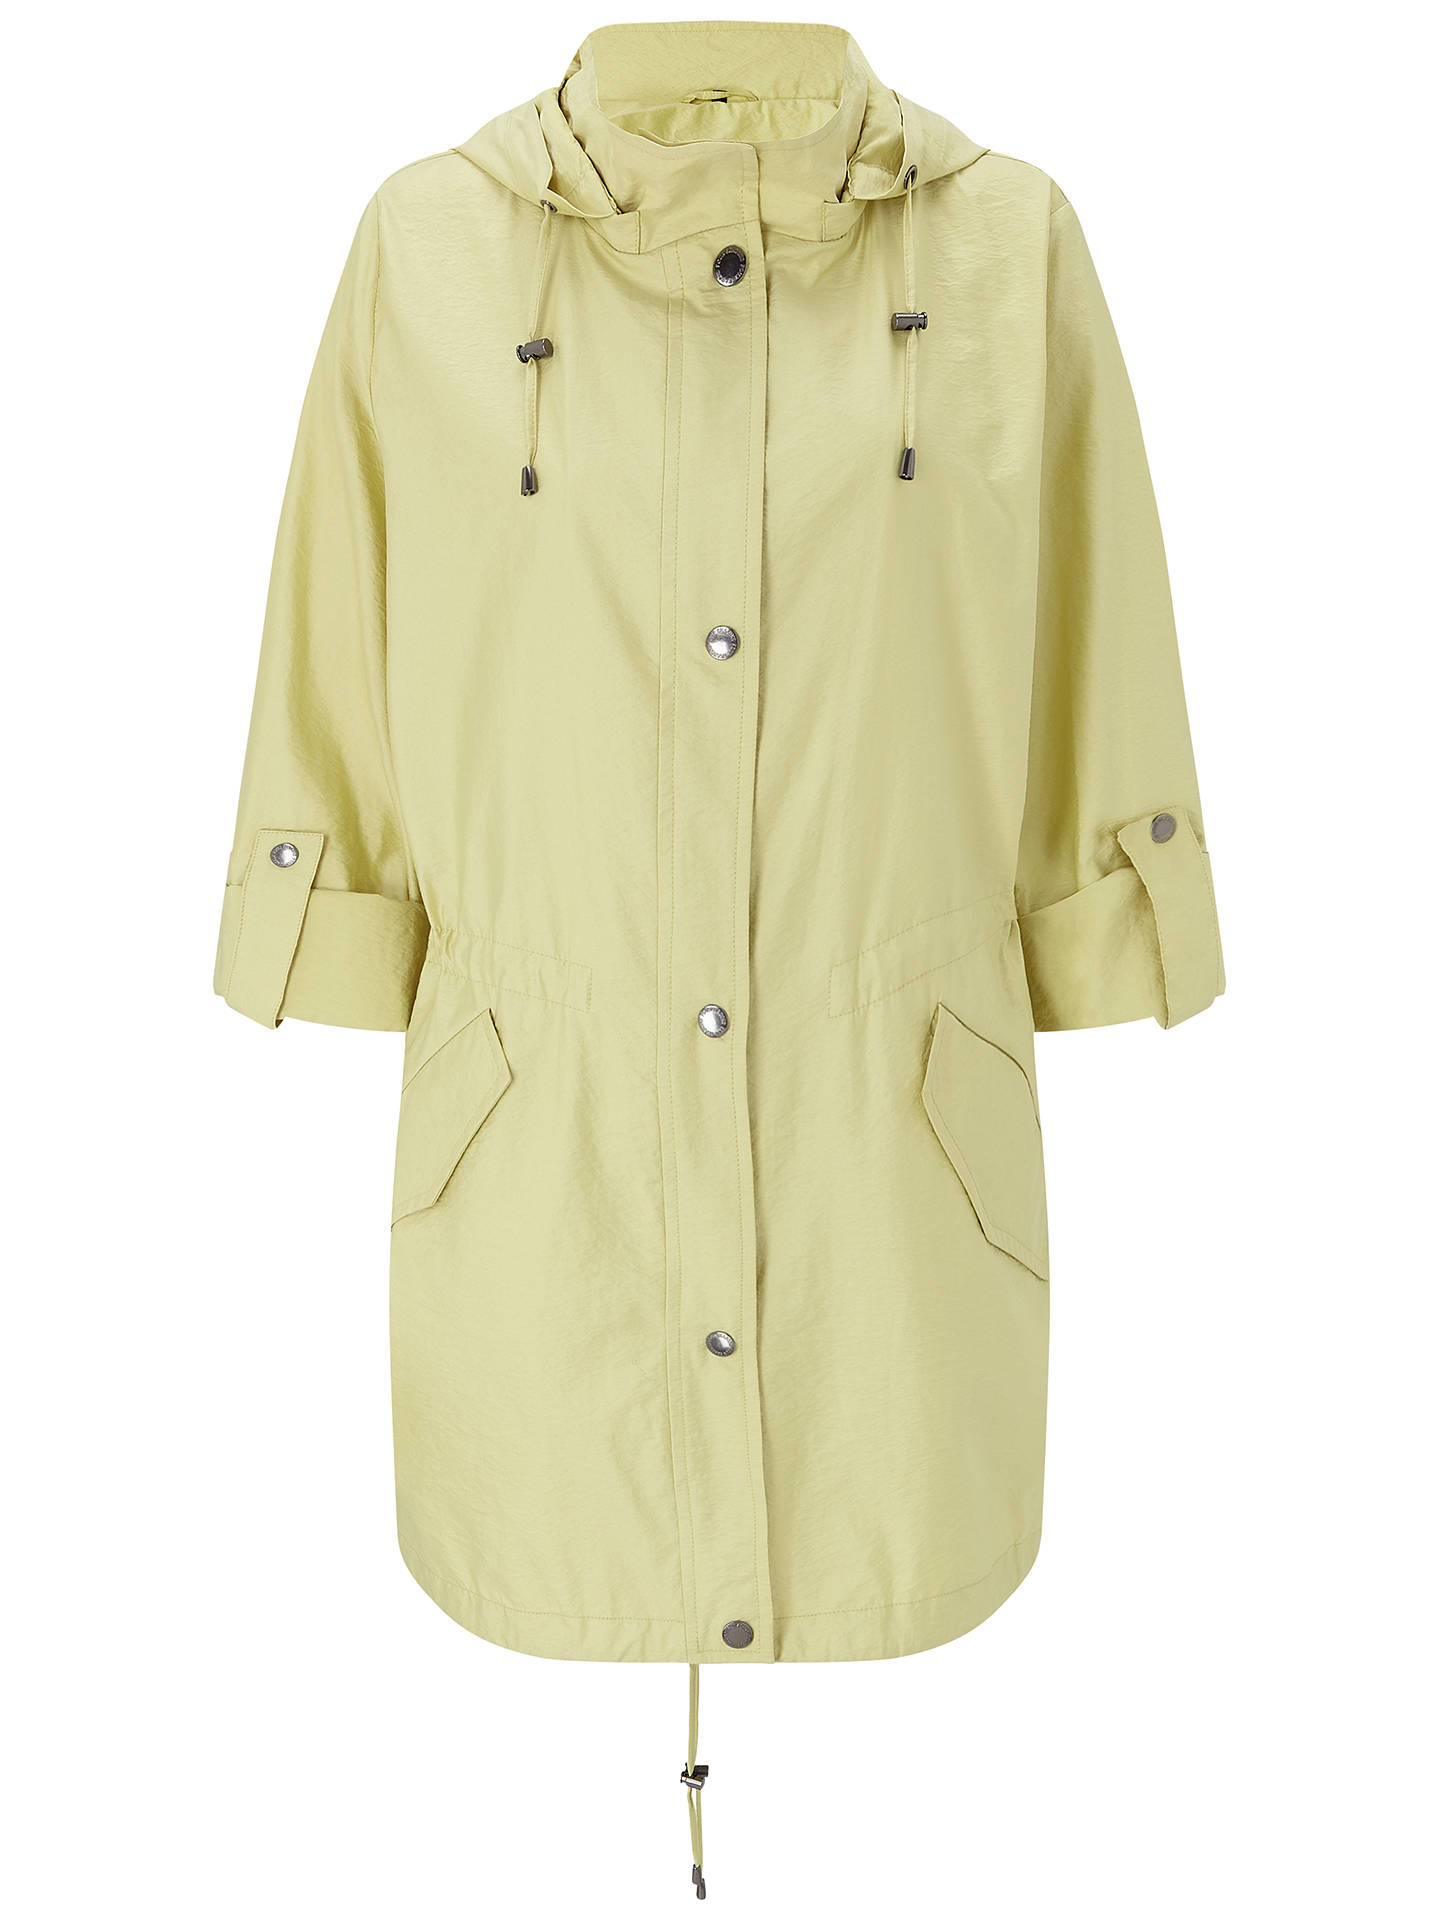 1bfe03f8b6f ... Buy Four Seasons Lightweight Hooded Parka Coat, Citrus, XS Online at  johnlewis.com ...